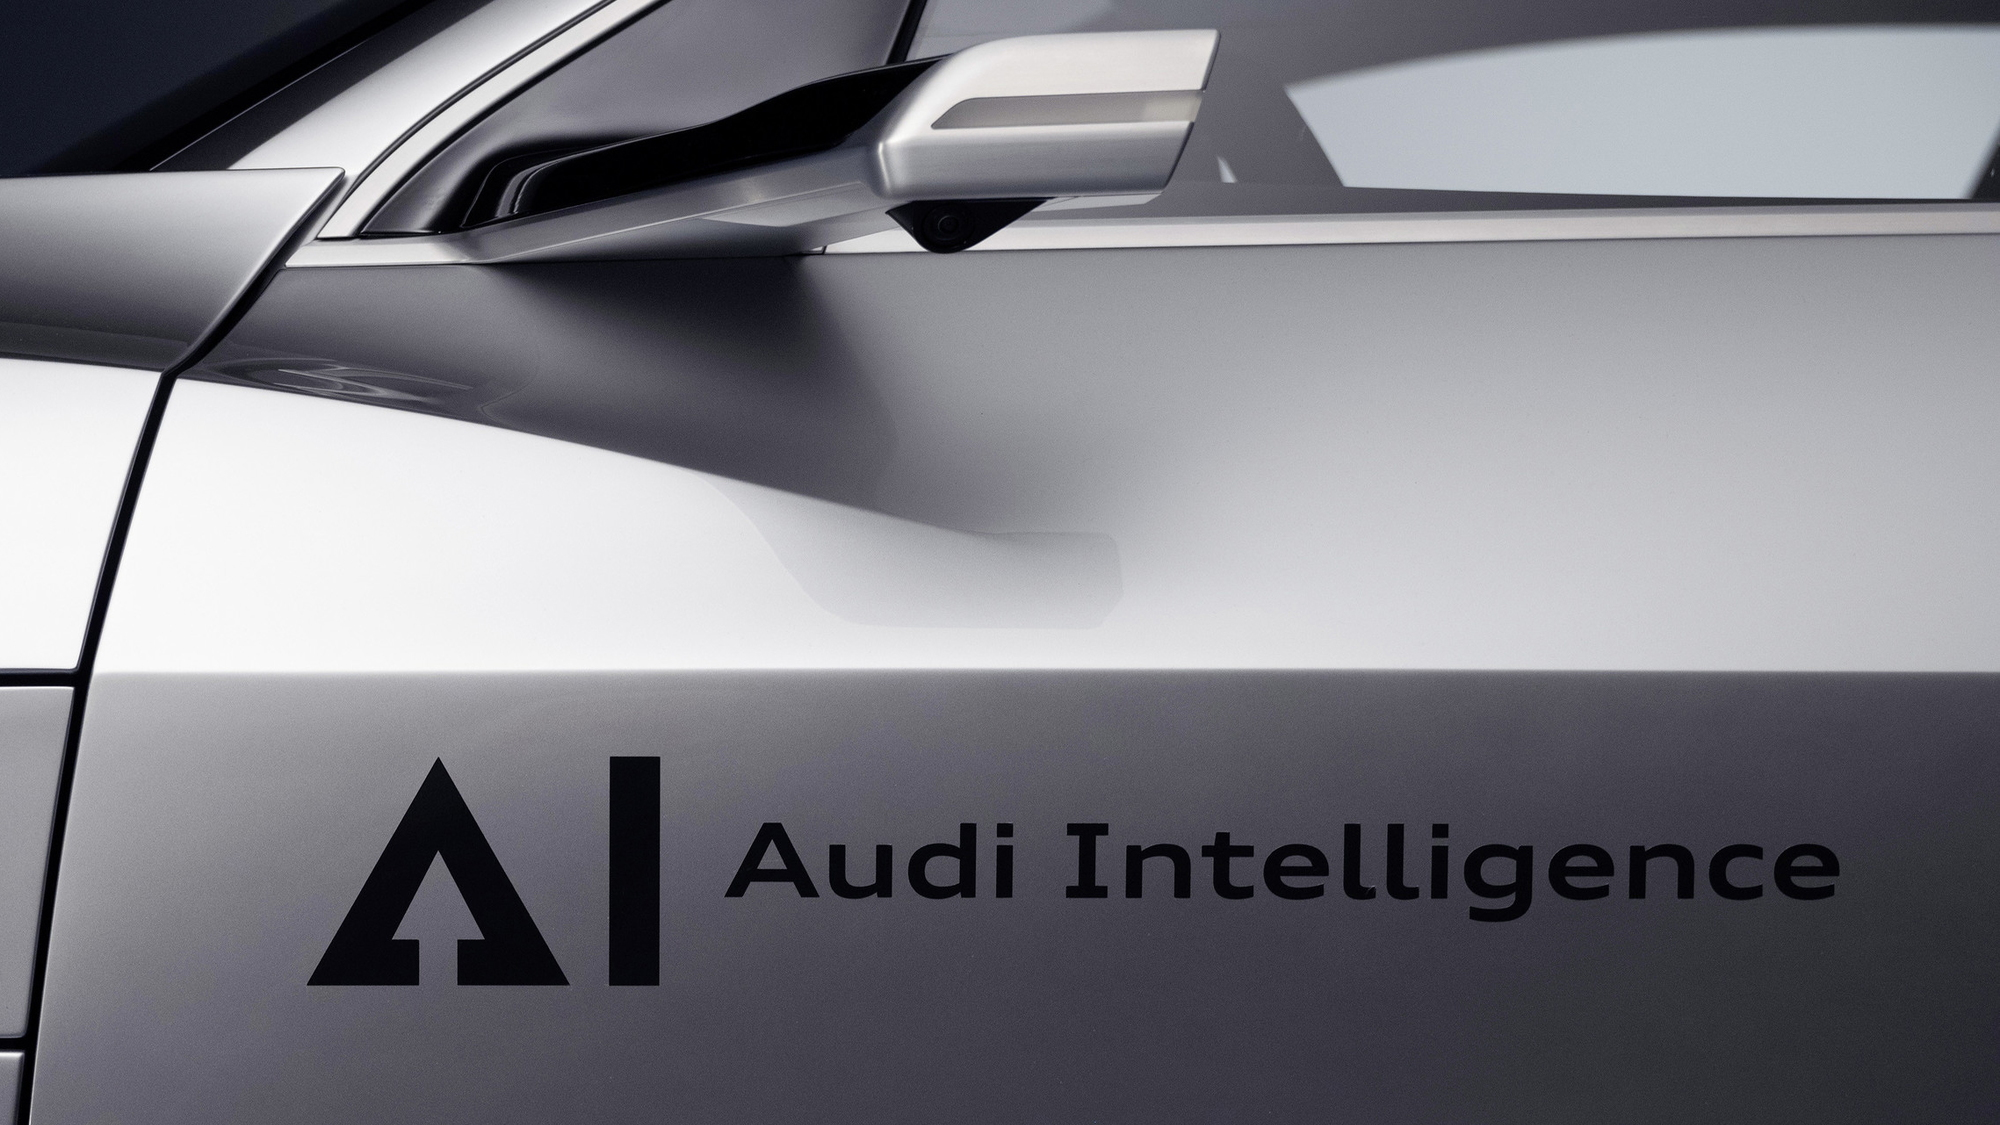 Audi side mirror camera